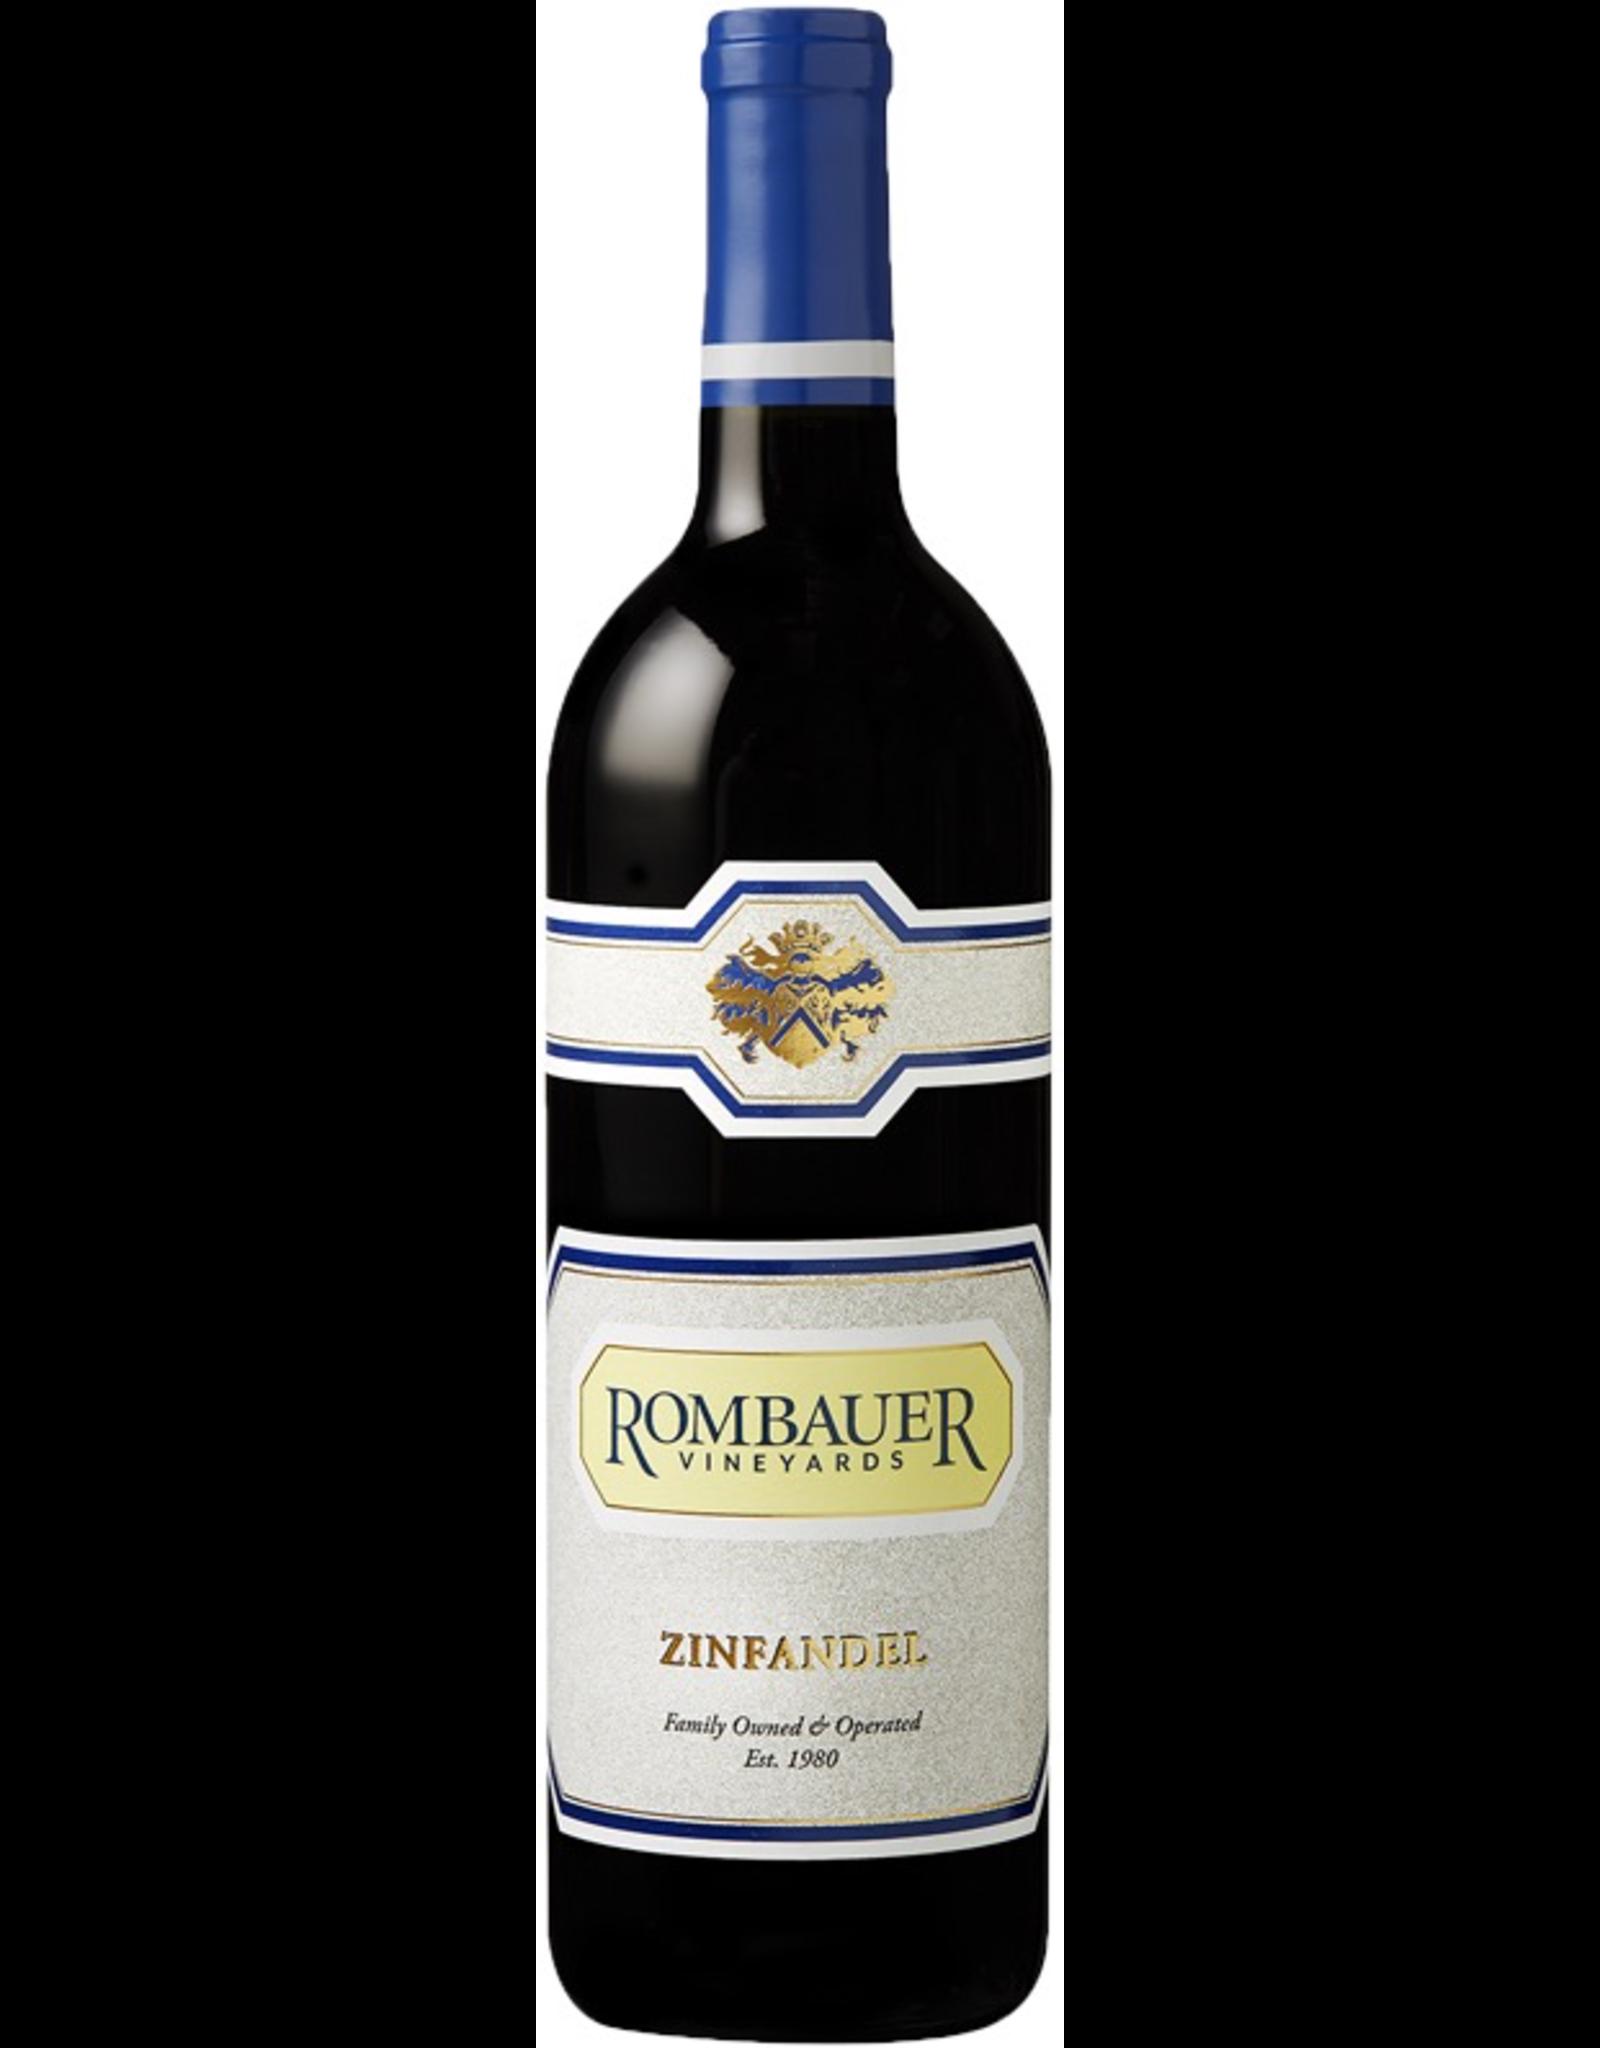 Red Wine 2018, Rombauer Vineyards, Zinfandel, Multi-regional Blend, Napa Valley, California, 15.9% Alc, CT89, RP90